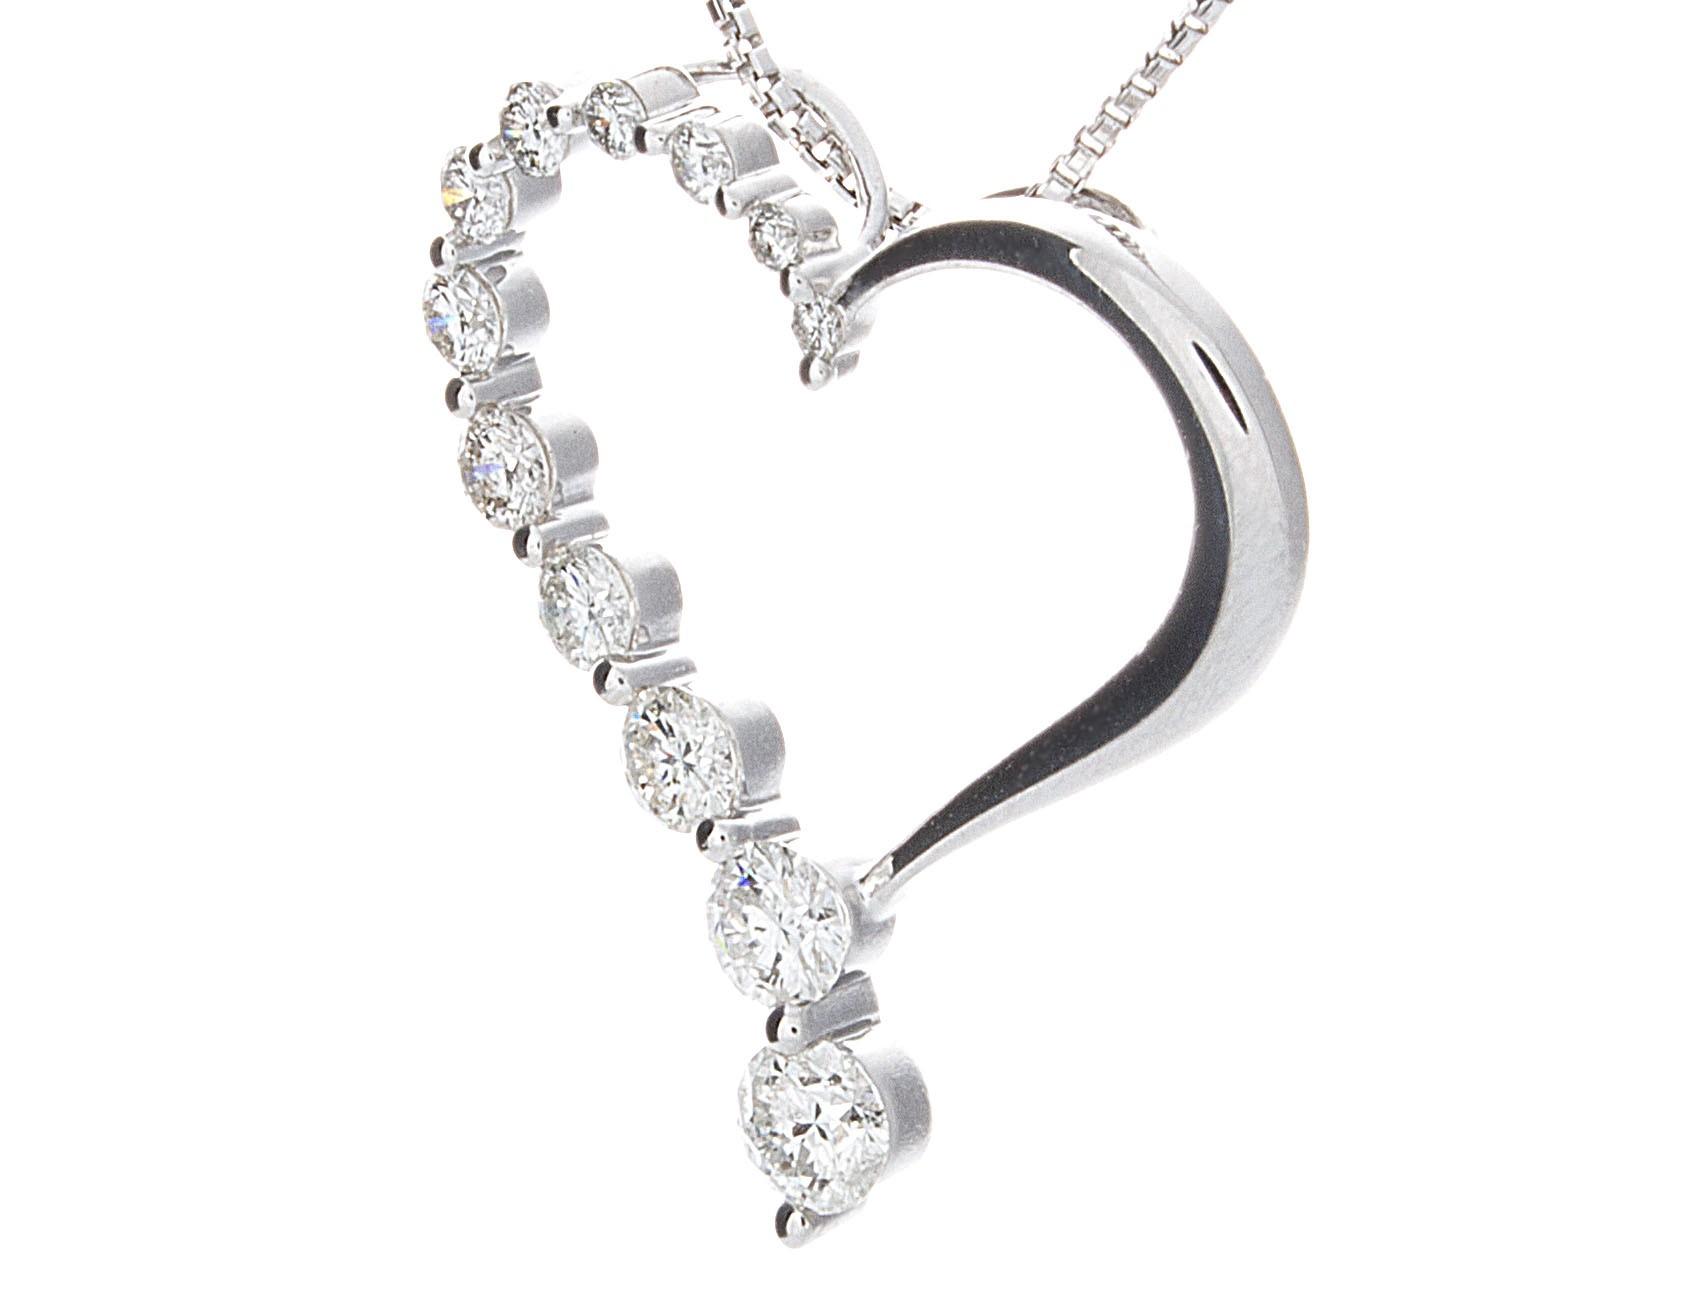 1686x1292 Certified Diamond Heart Journey Pendant In 14k White Gold G H,si1